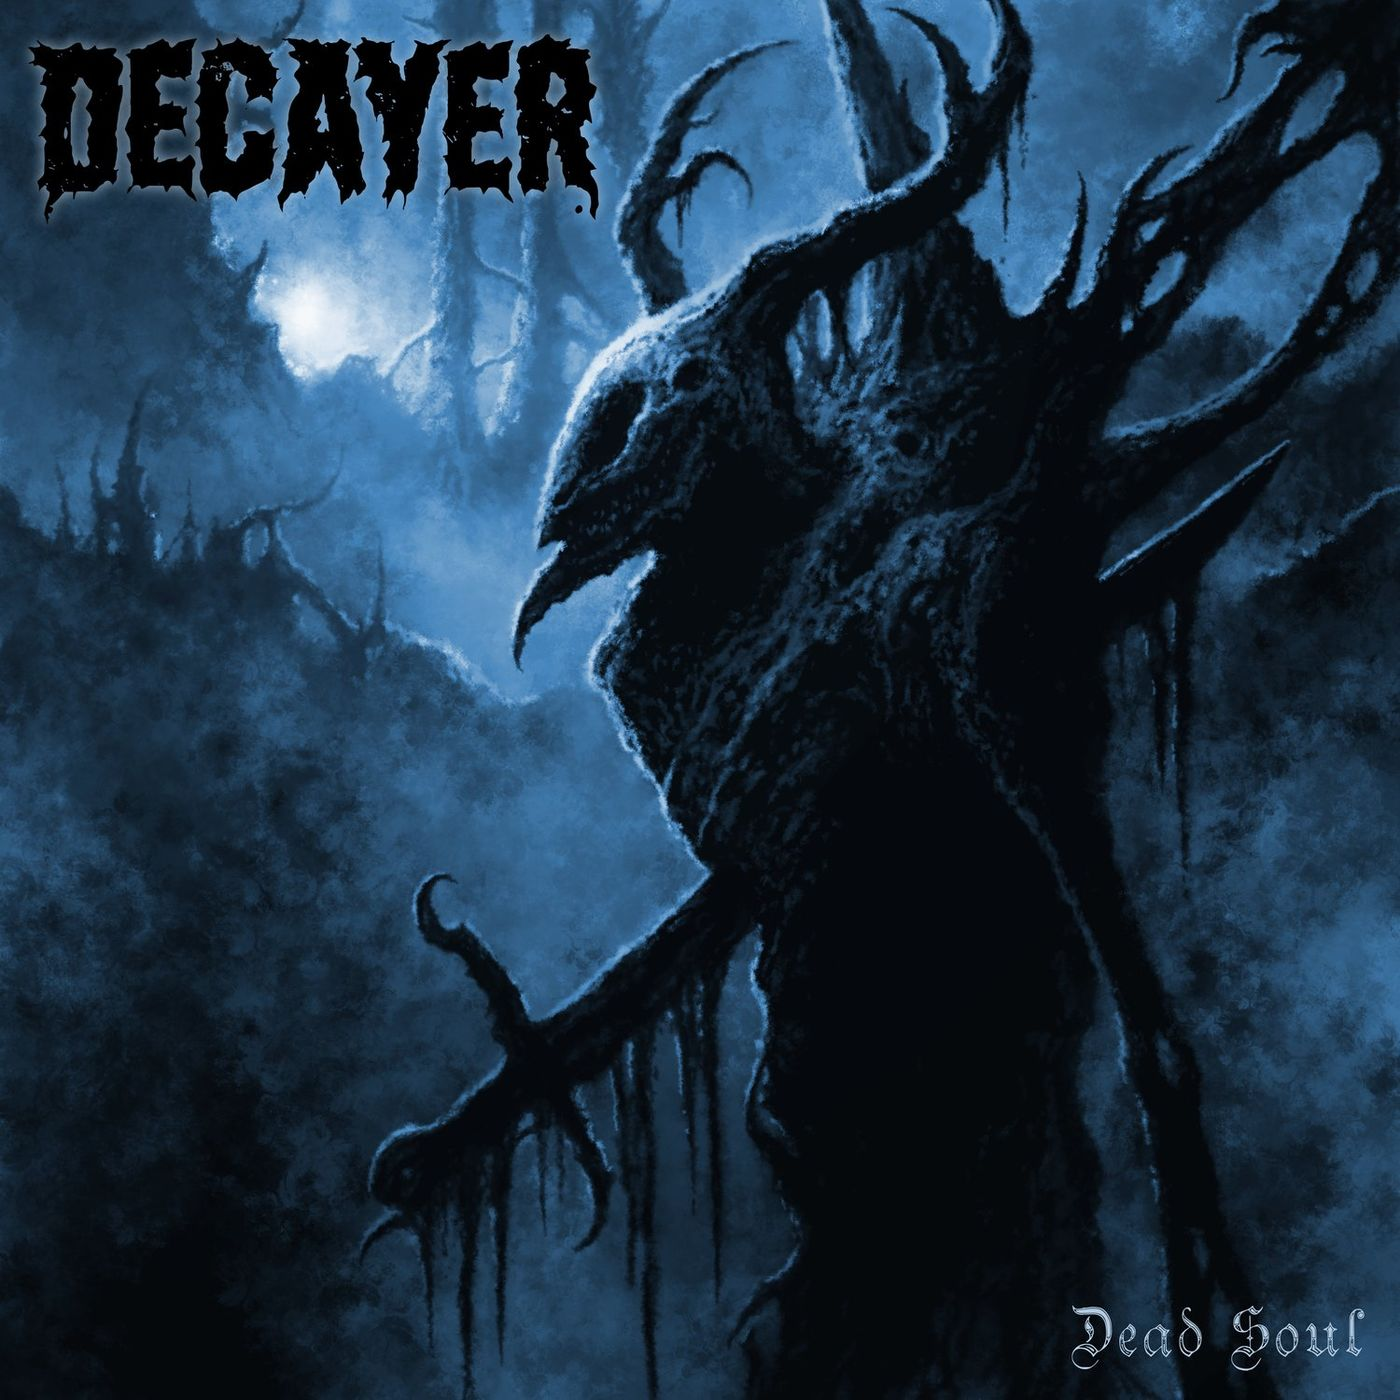 Decayer - Dead Soul [single] (2021)